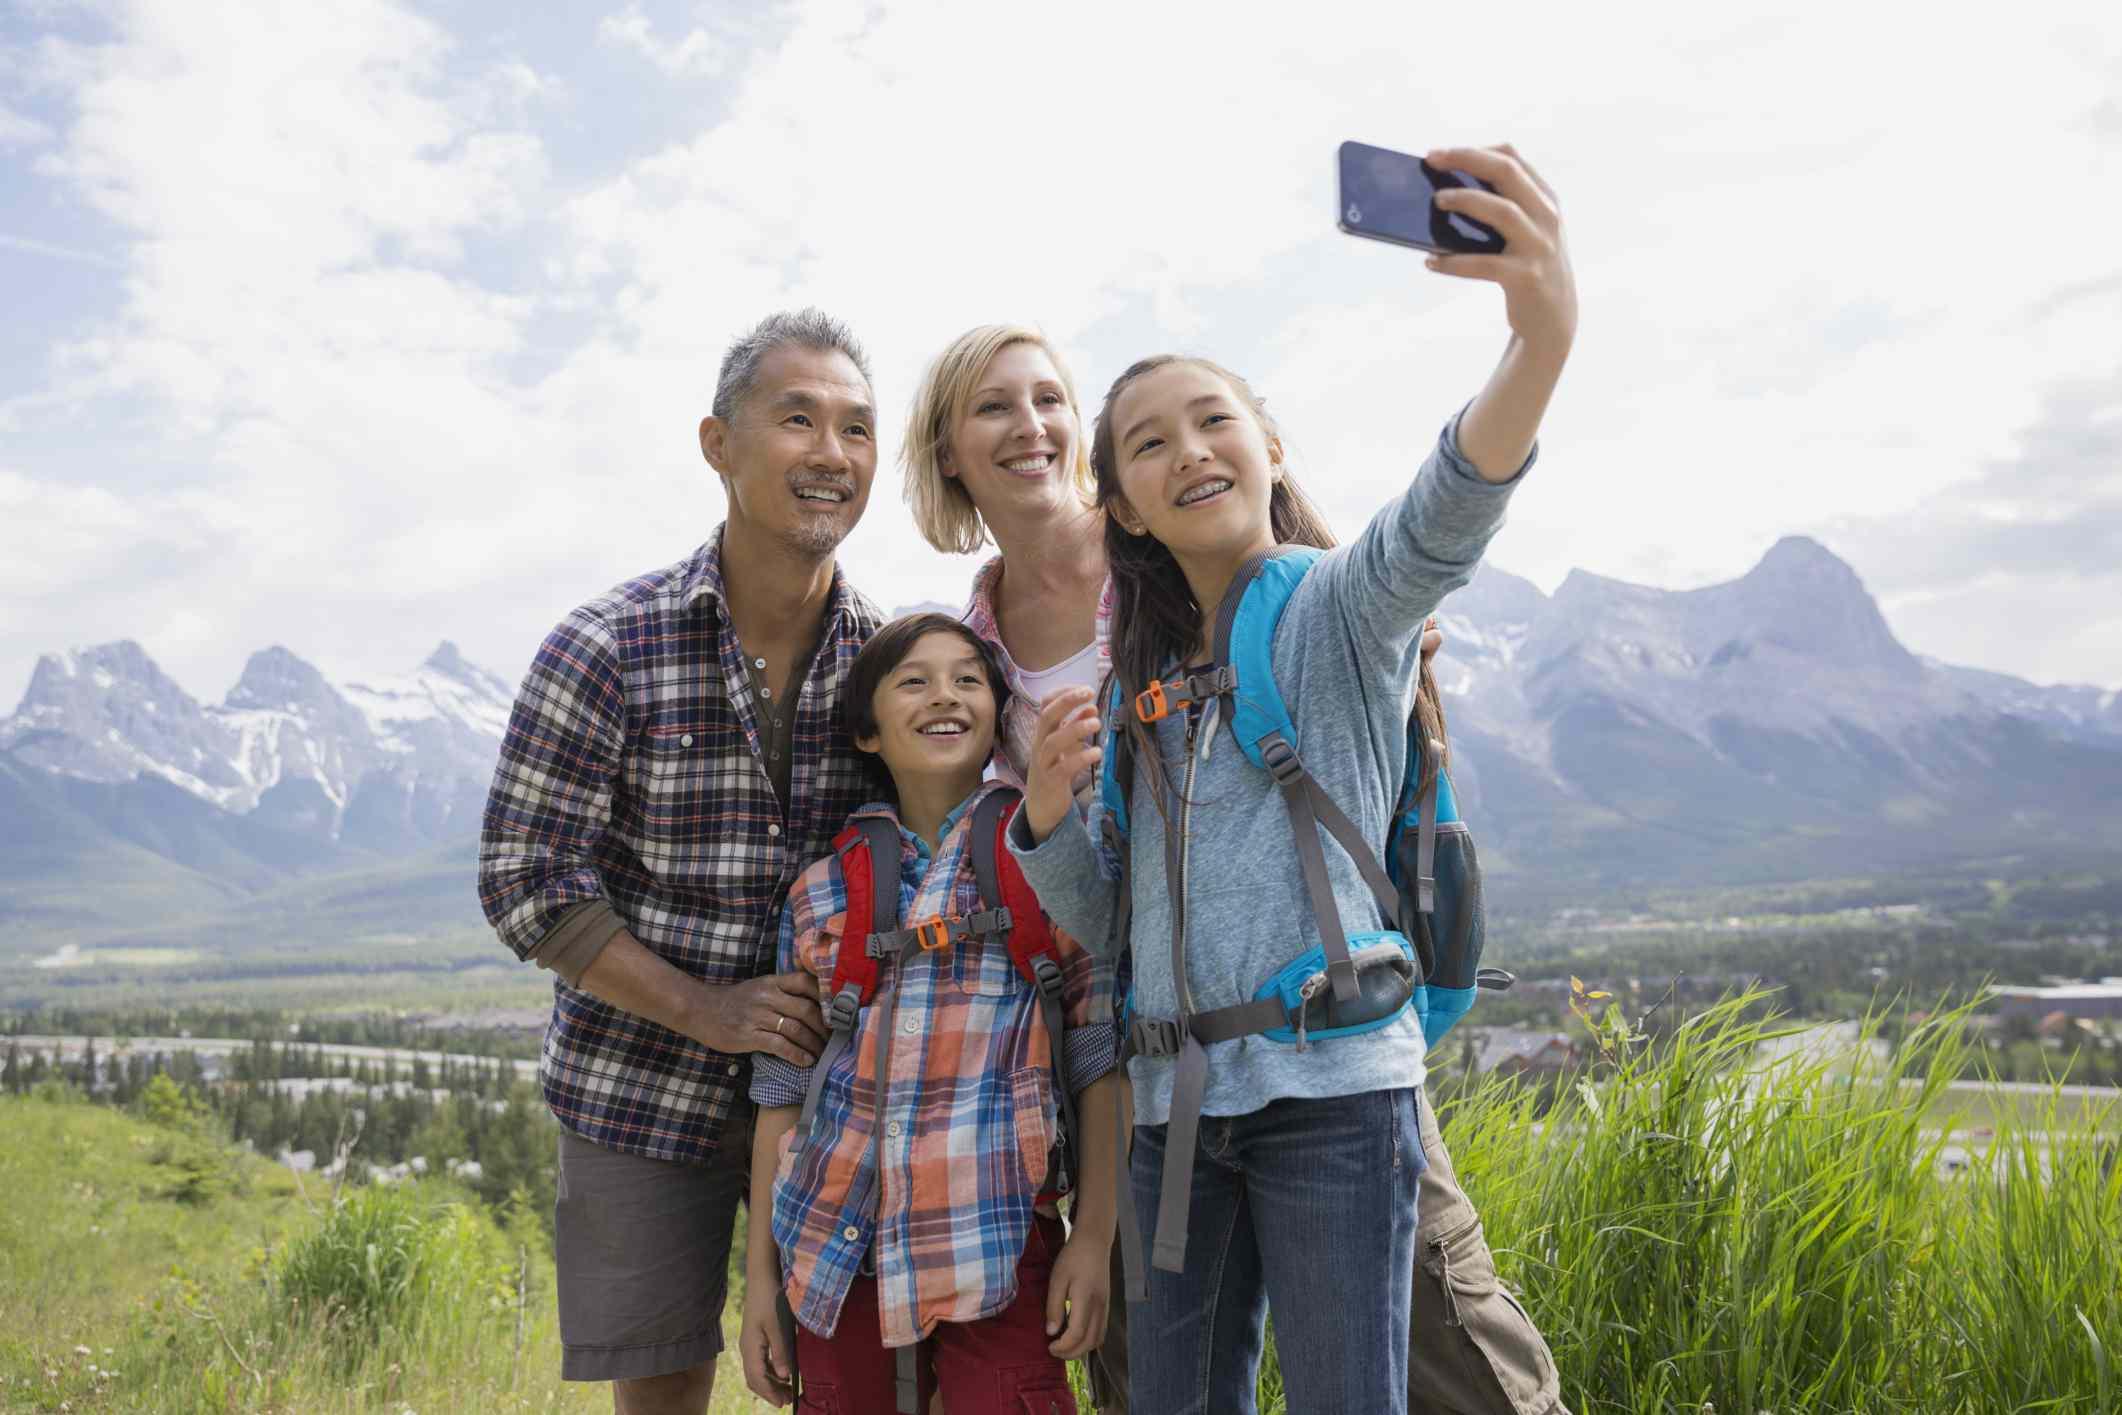 Family on vacation taking photo